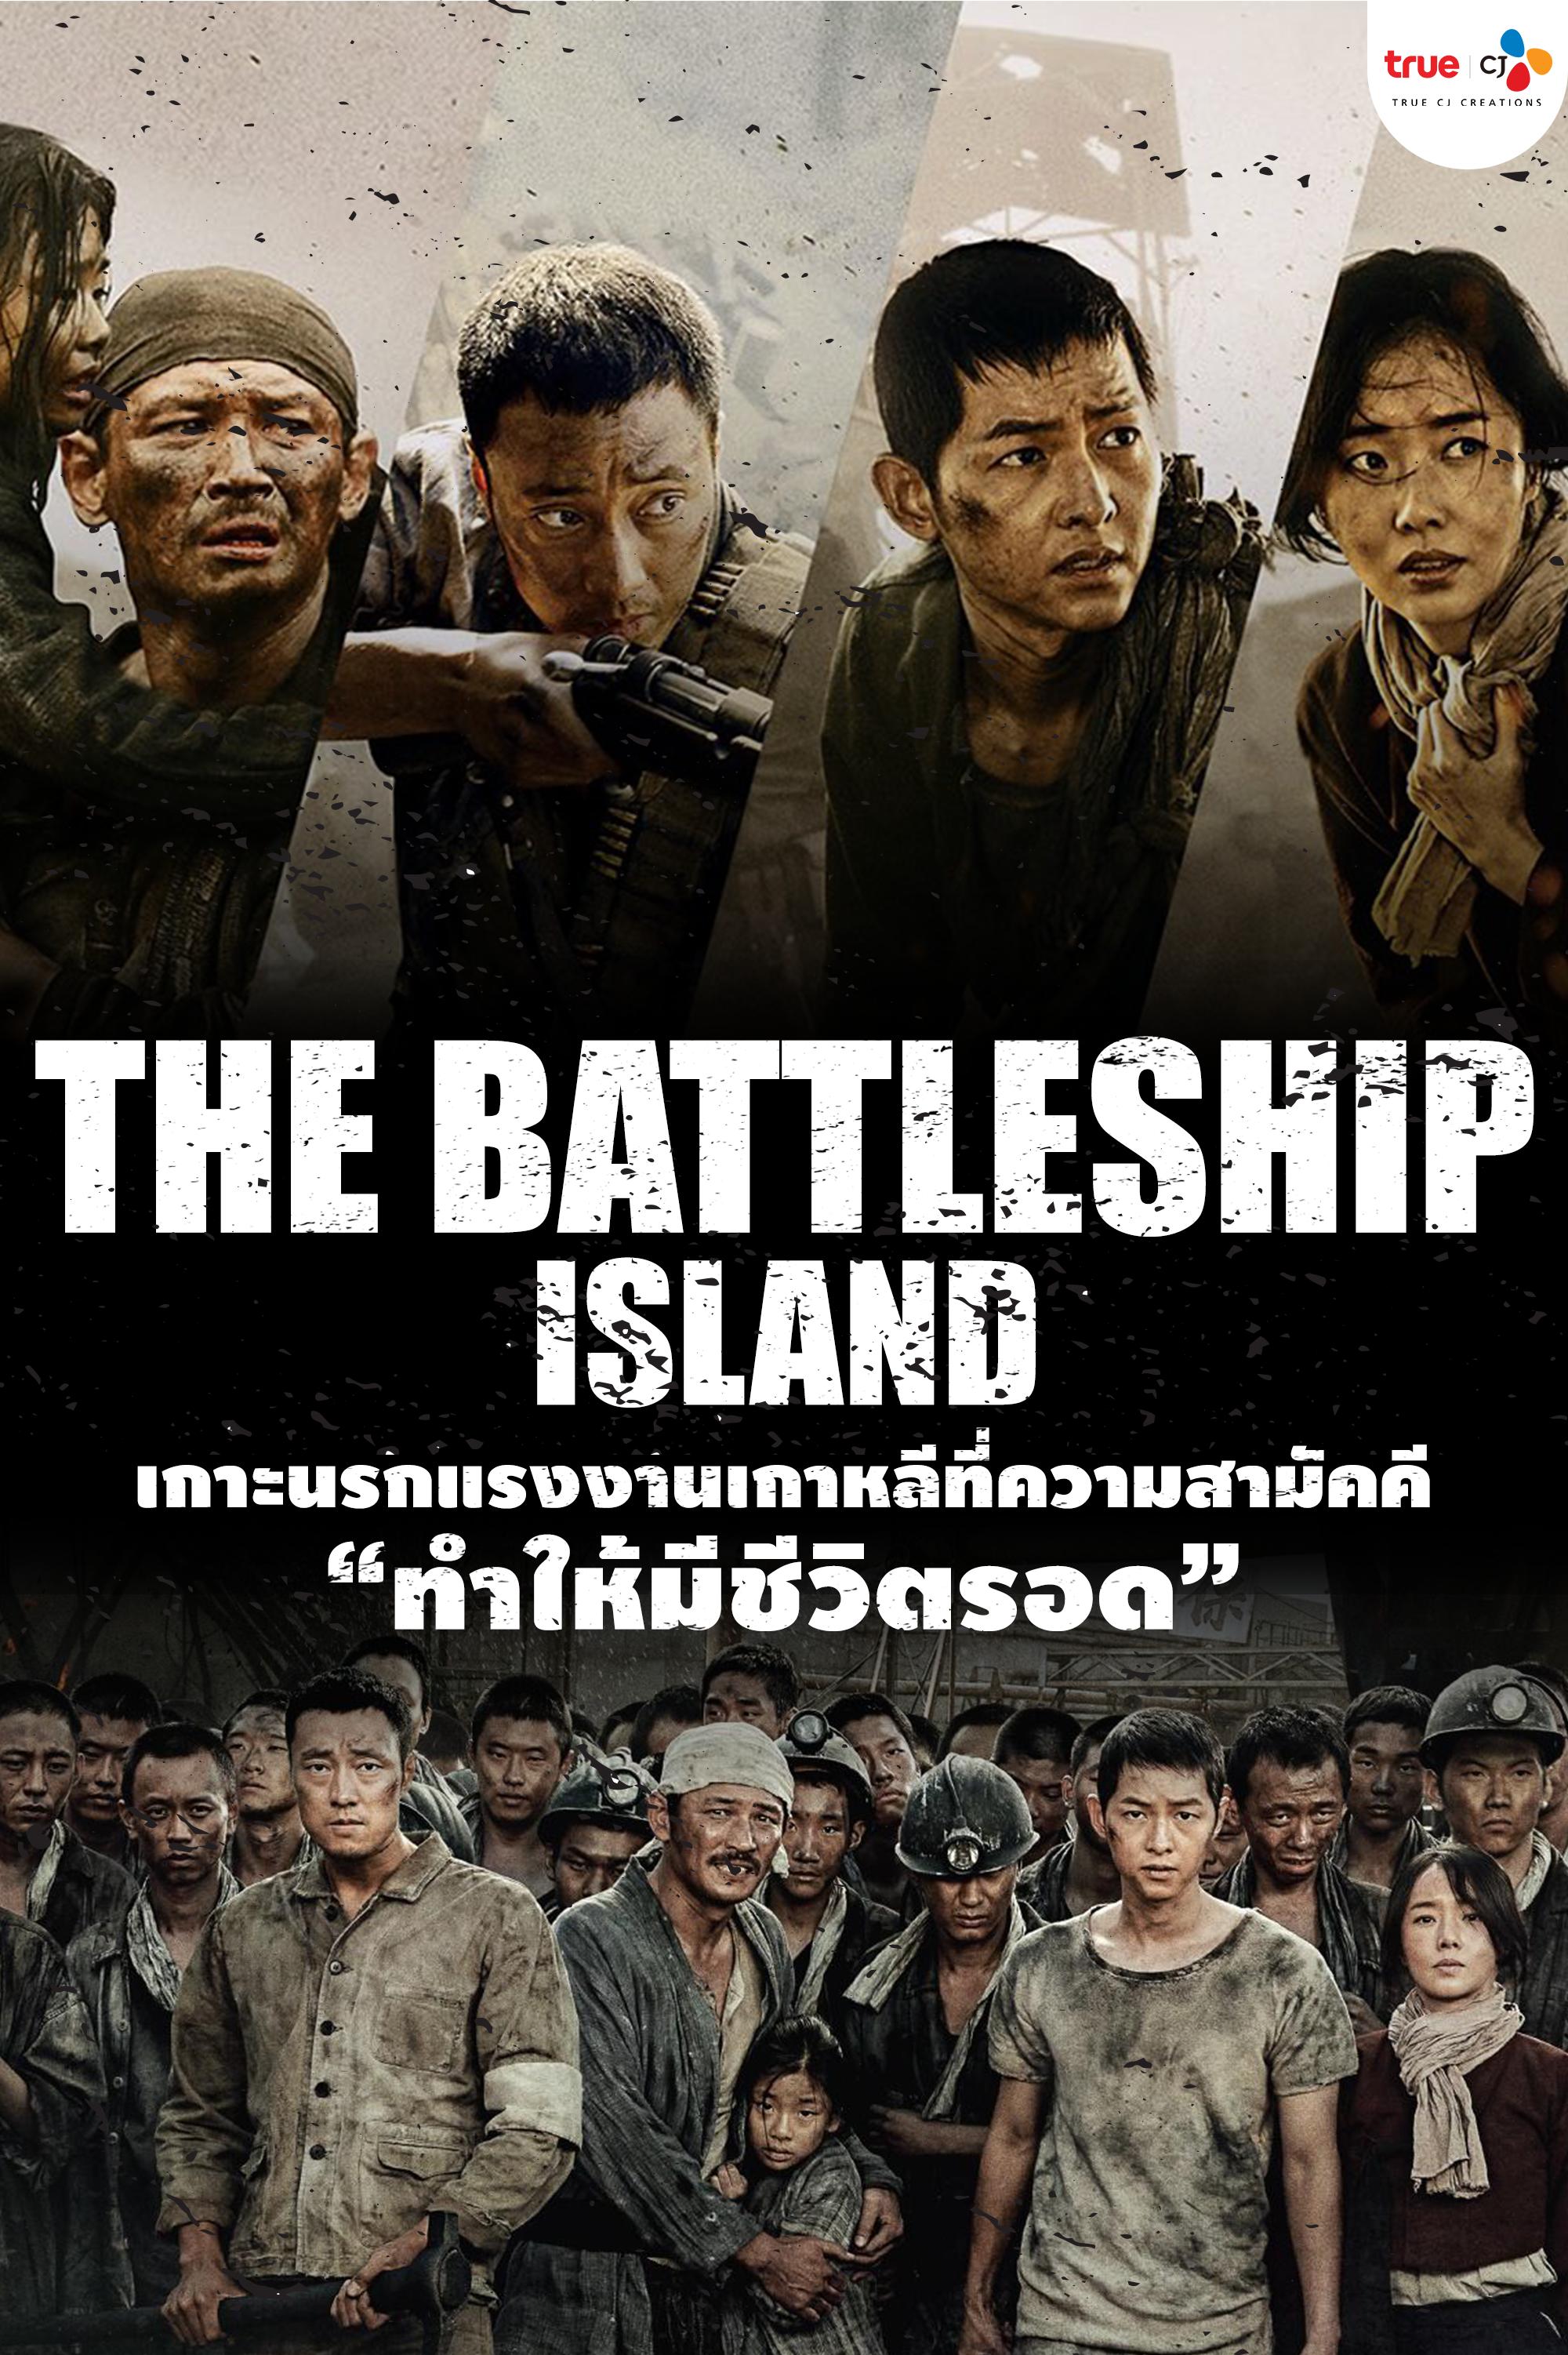 The Battleship Island_2-3